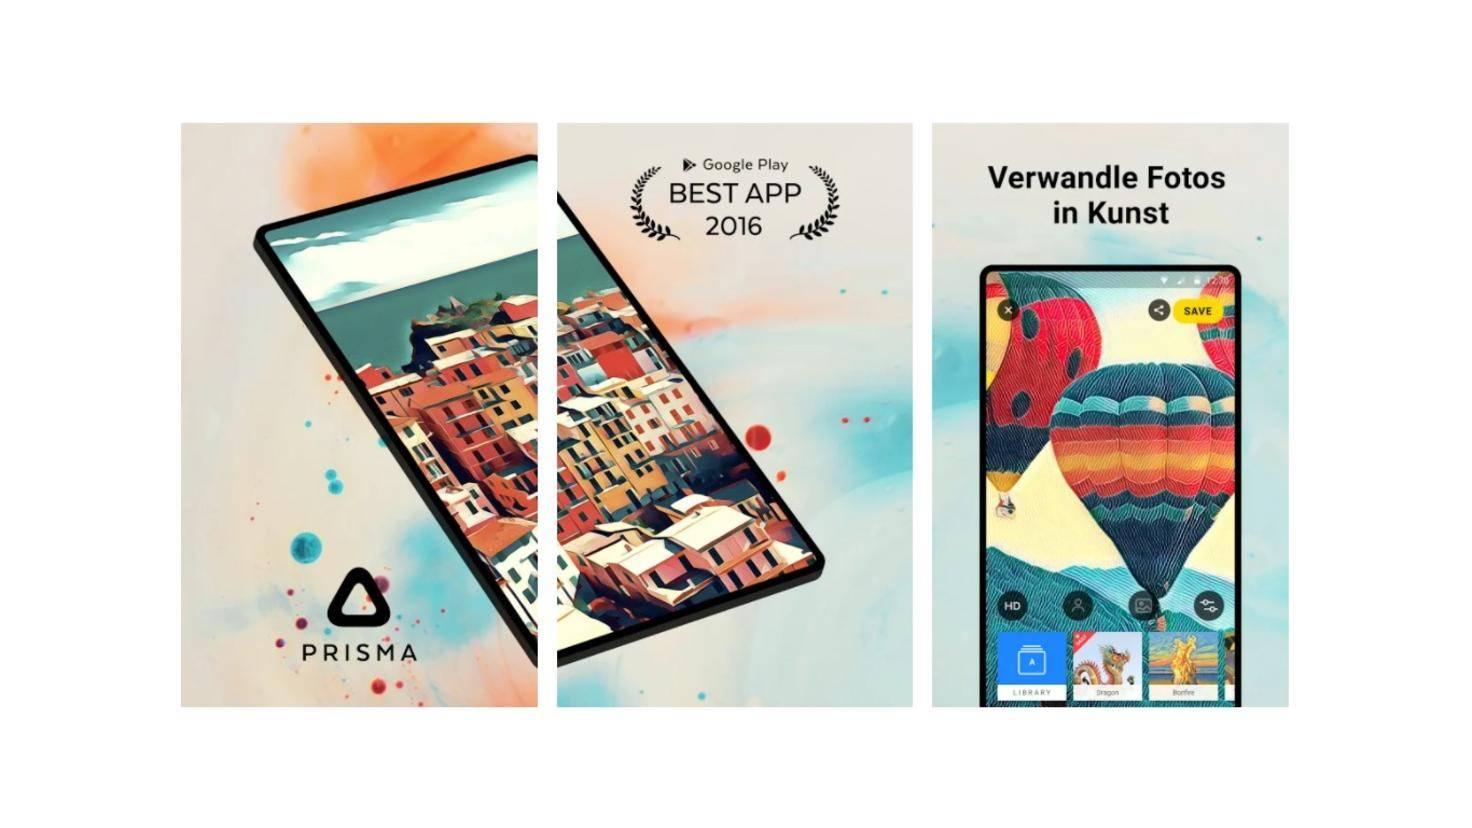 prisma-foto-app-android-ios